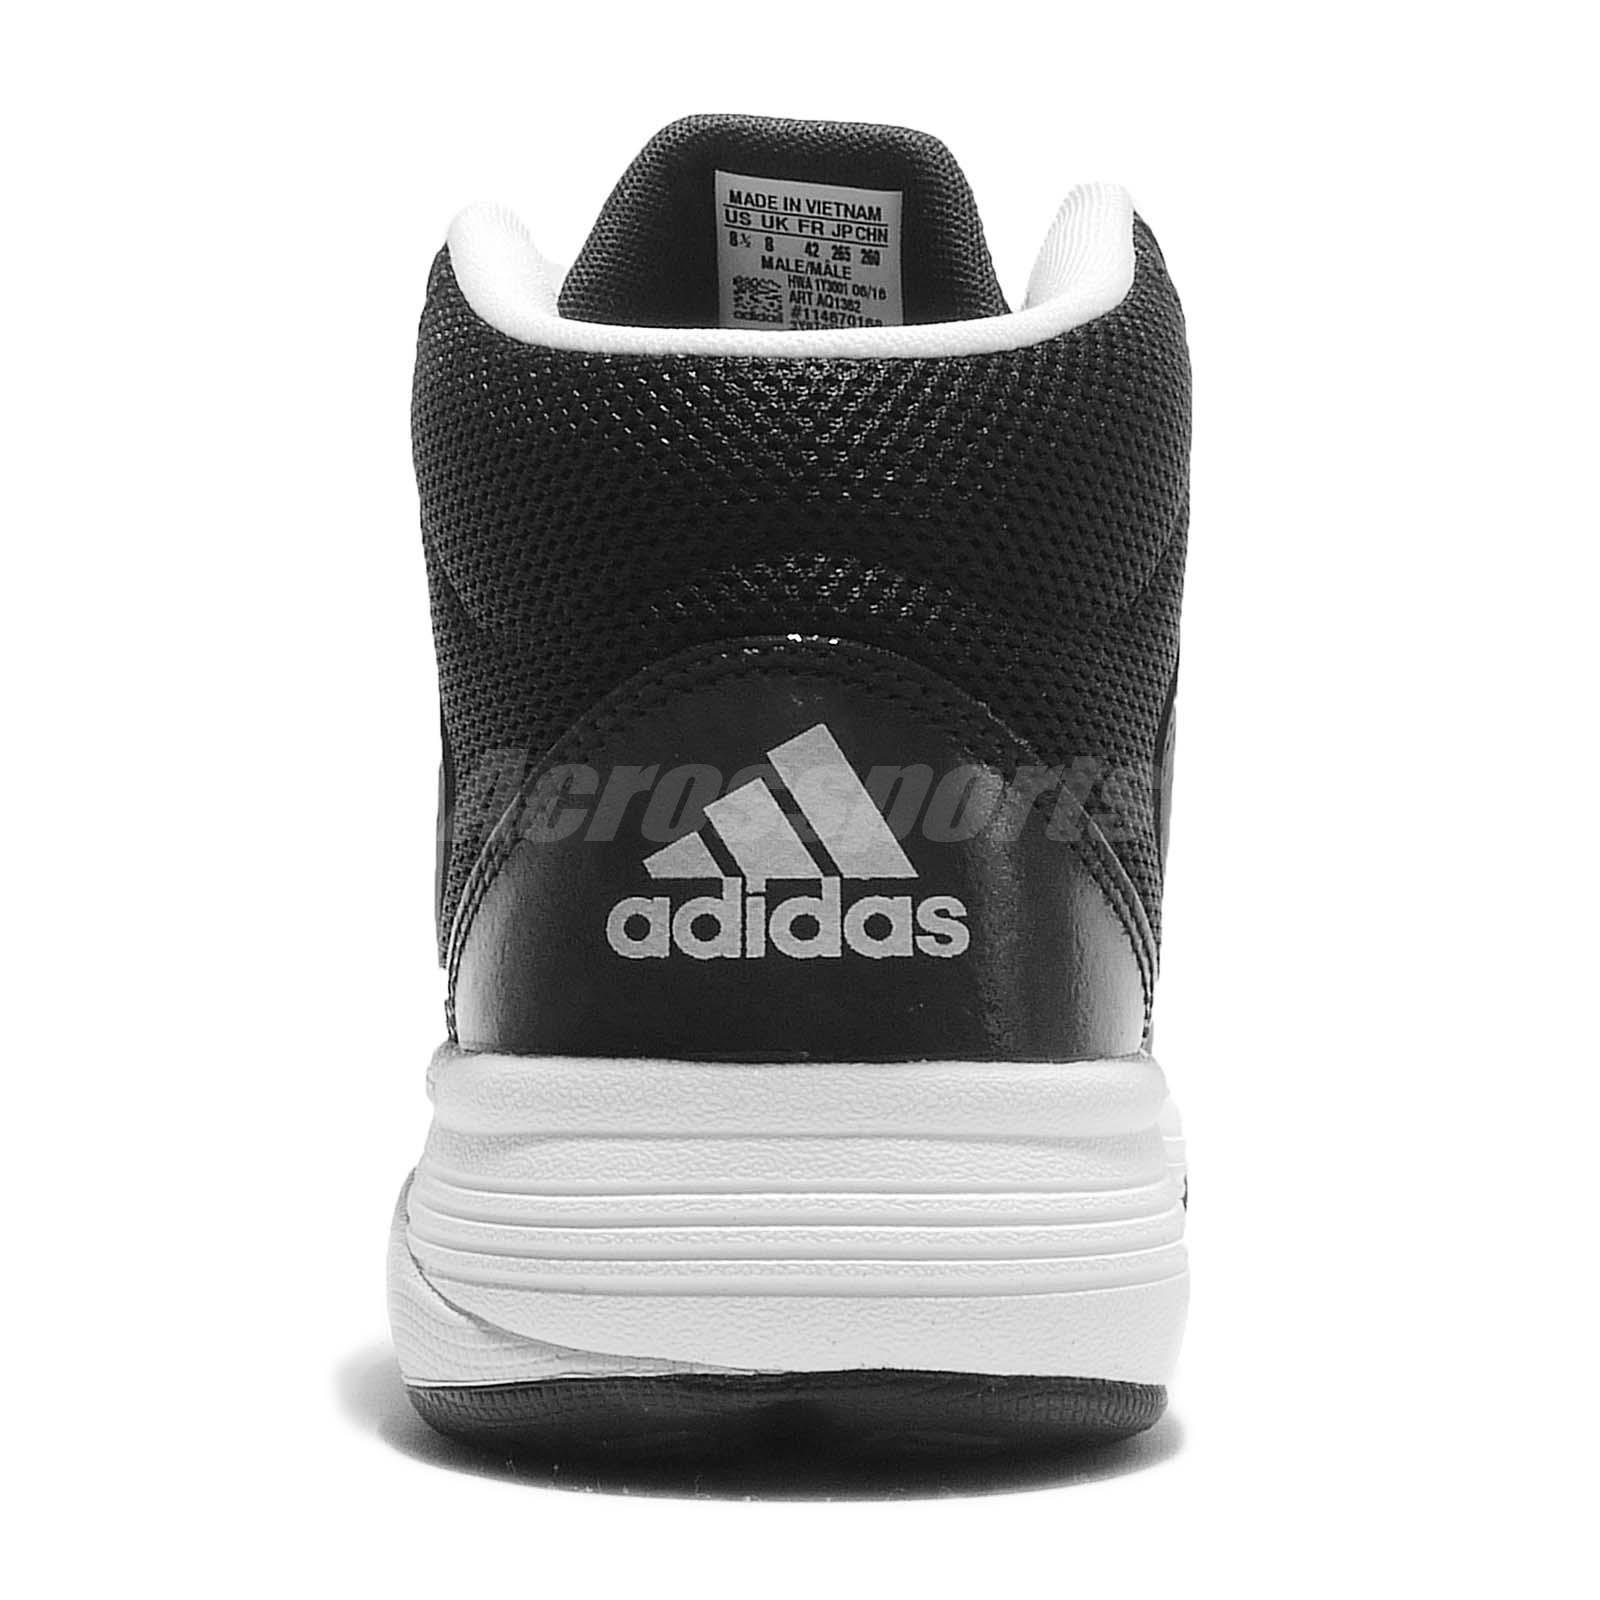 adidas basketball shoes vietnam